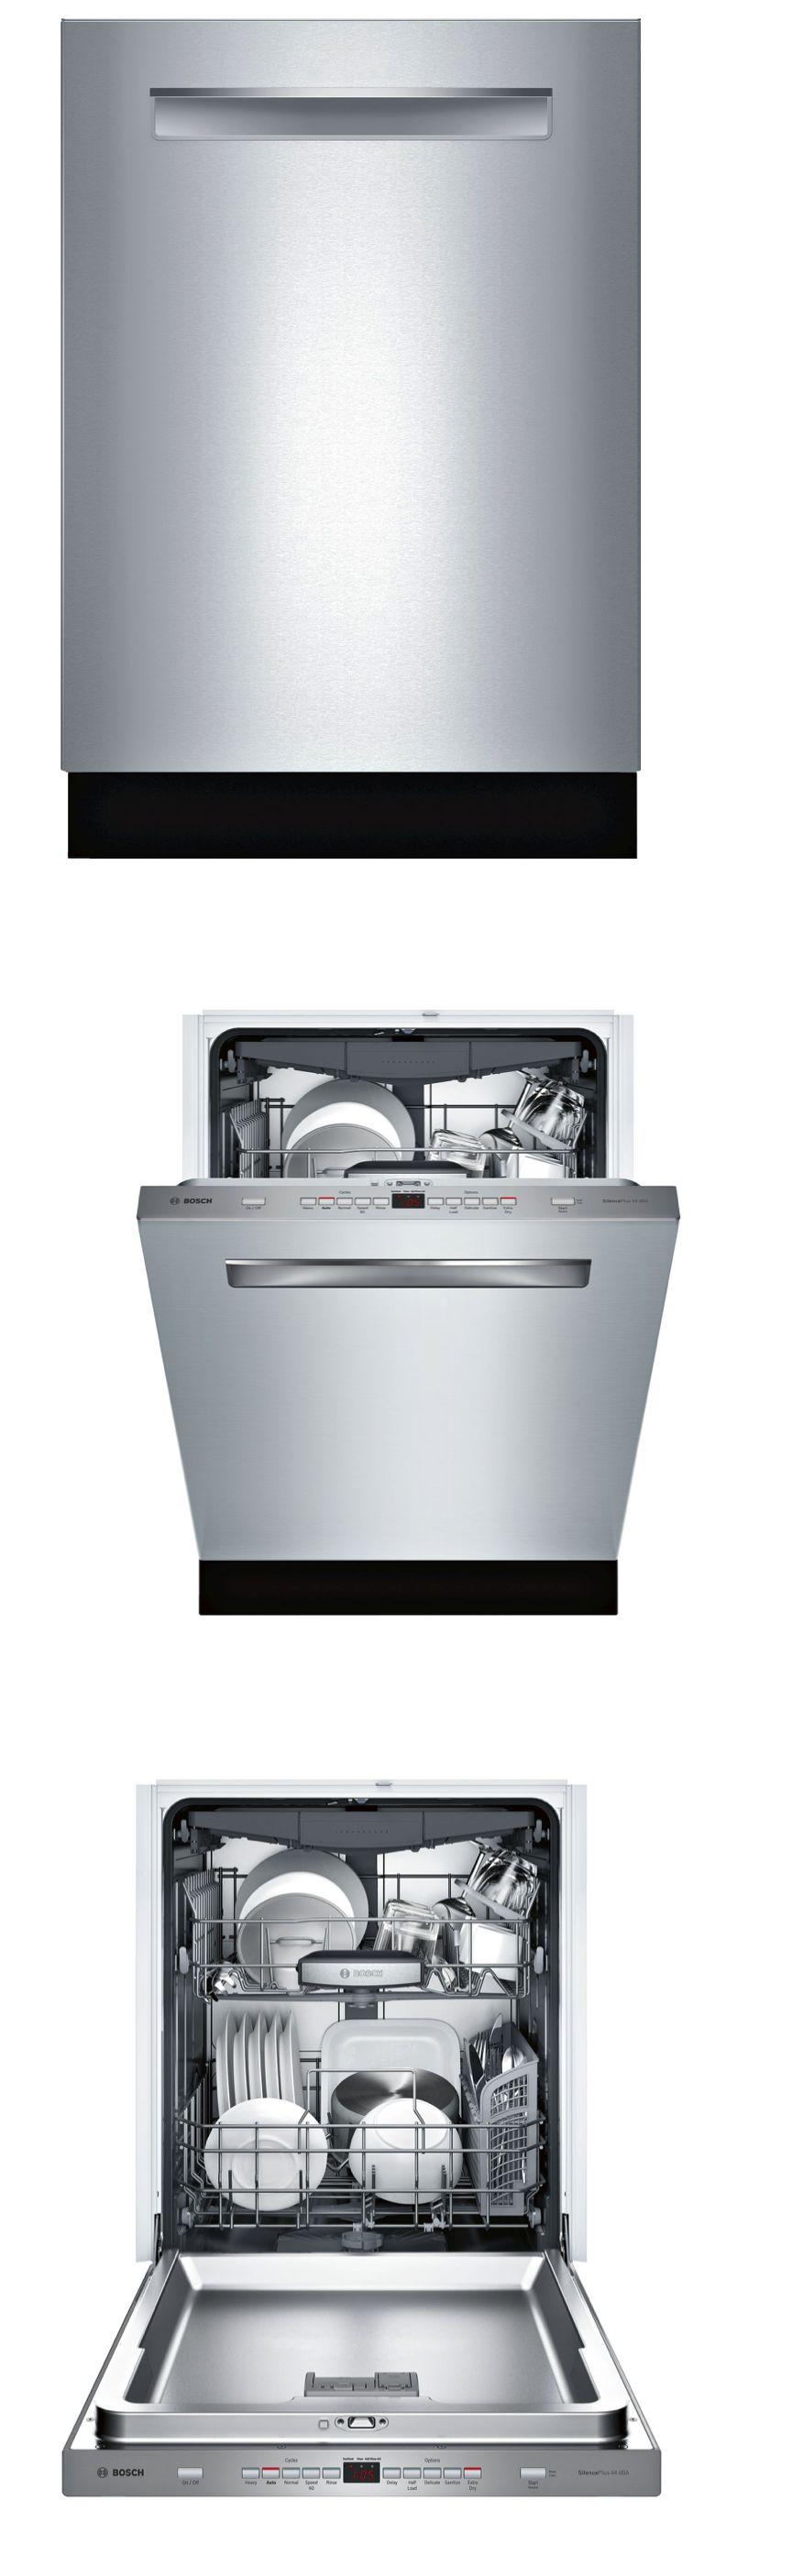 Park Art|My WordPress Blog_How To Install Bosch Dishwasher India